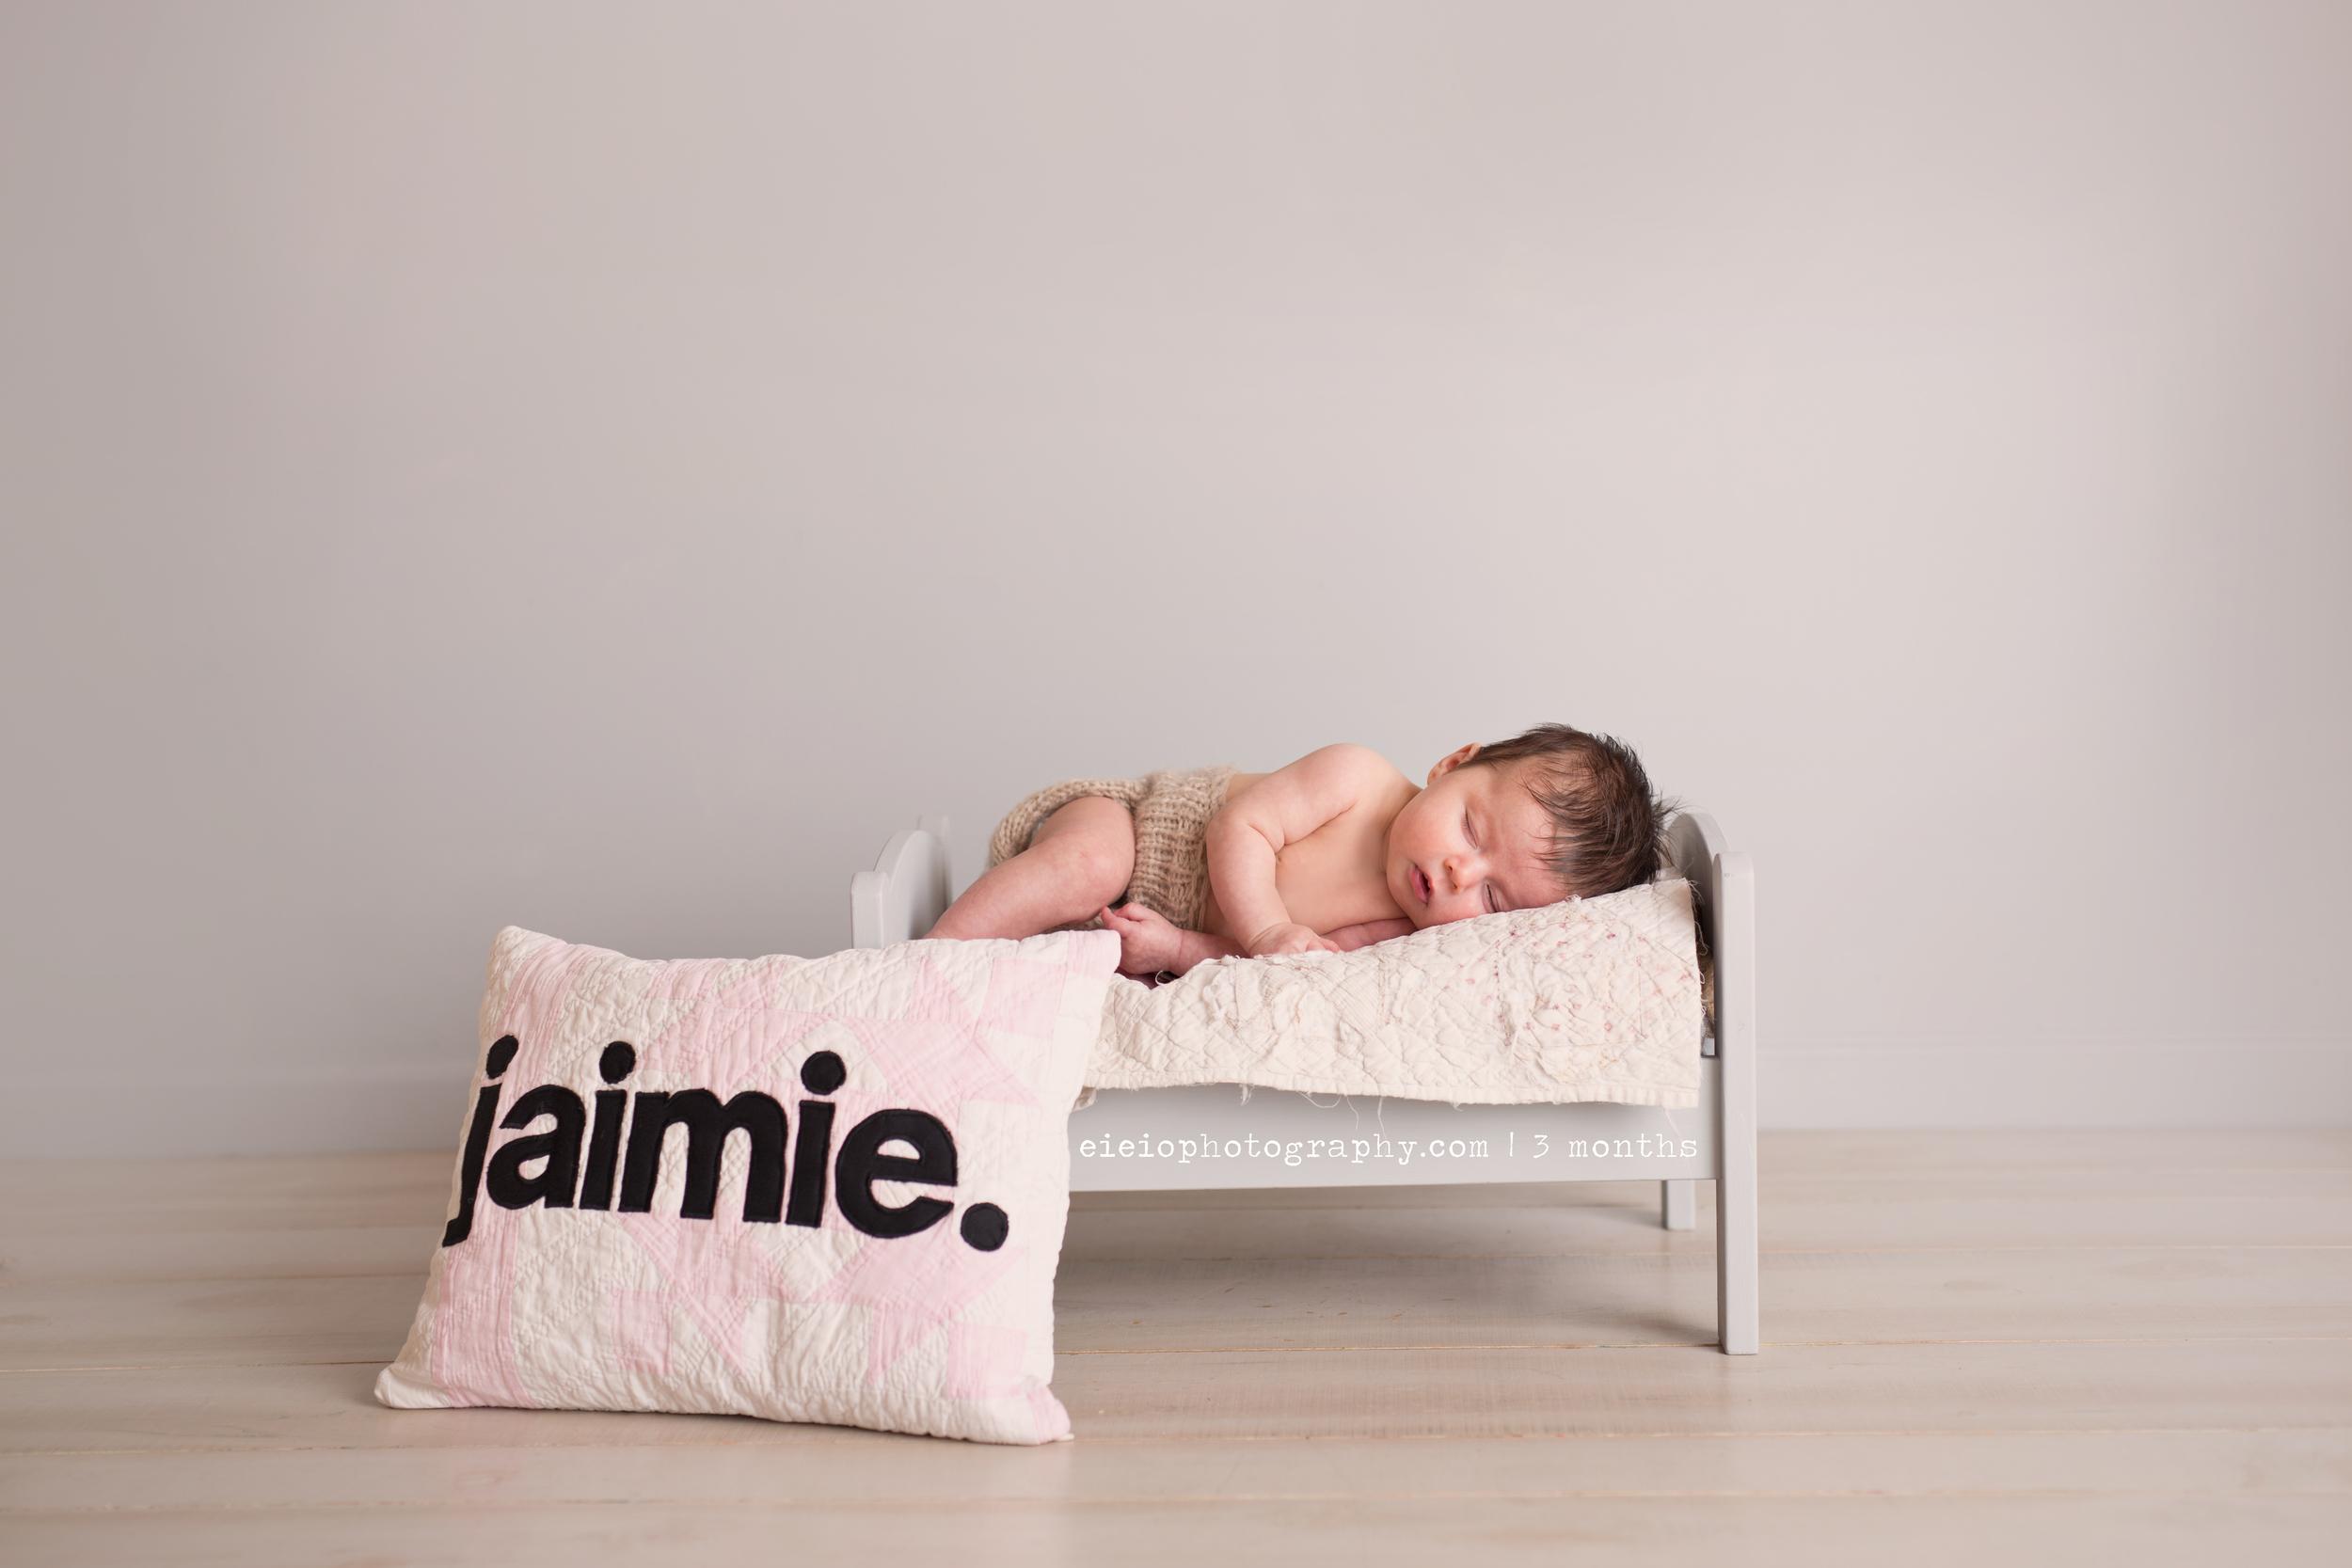 Jaimie | NorthGlow Photography